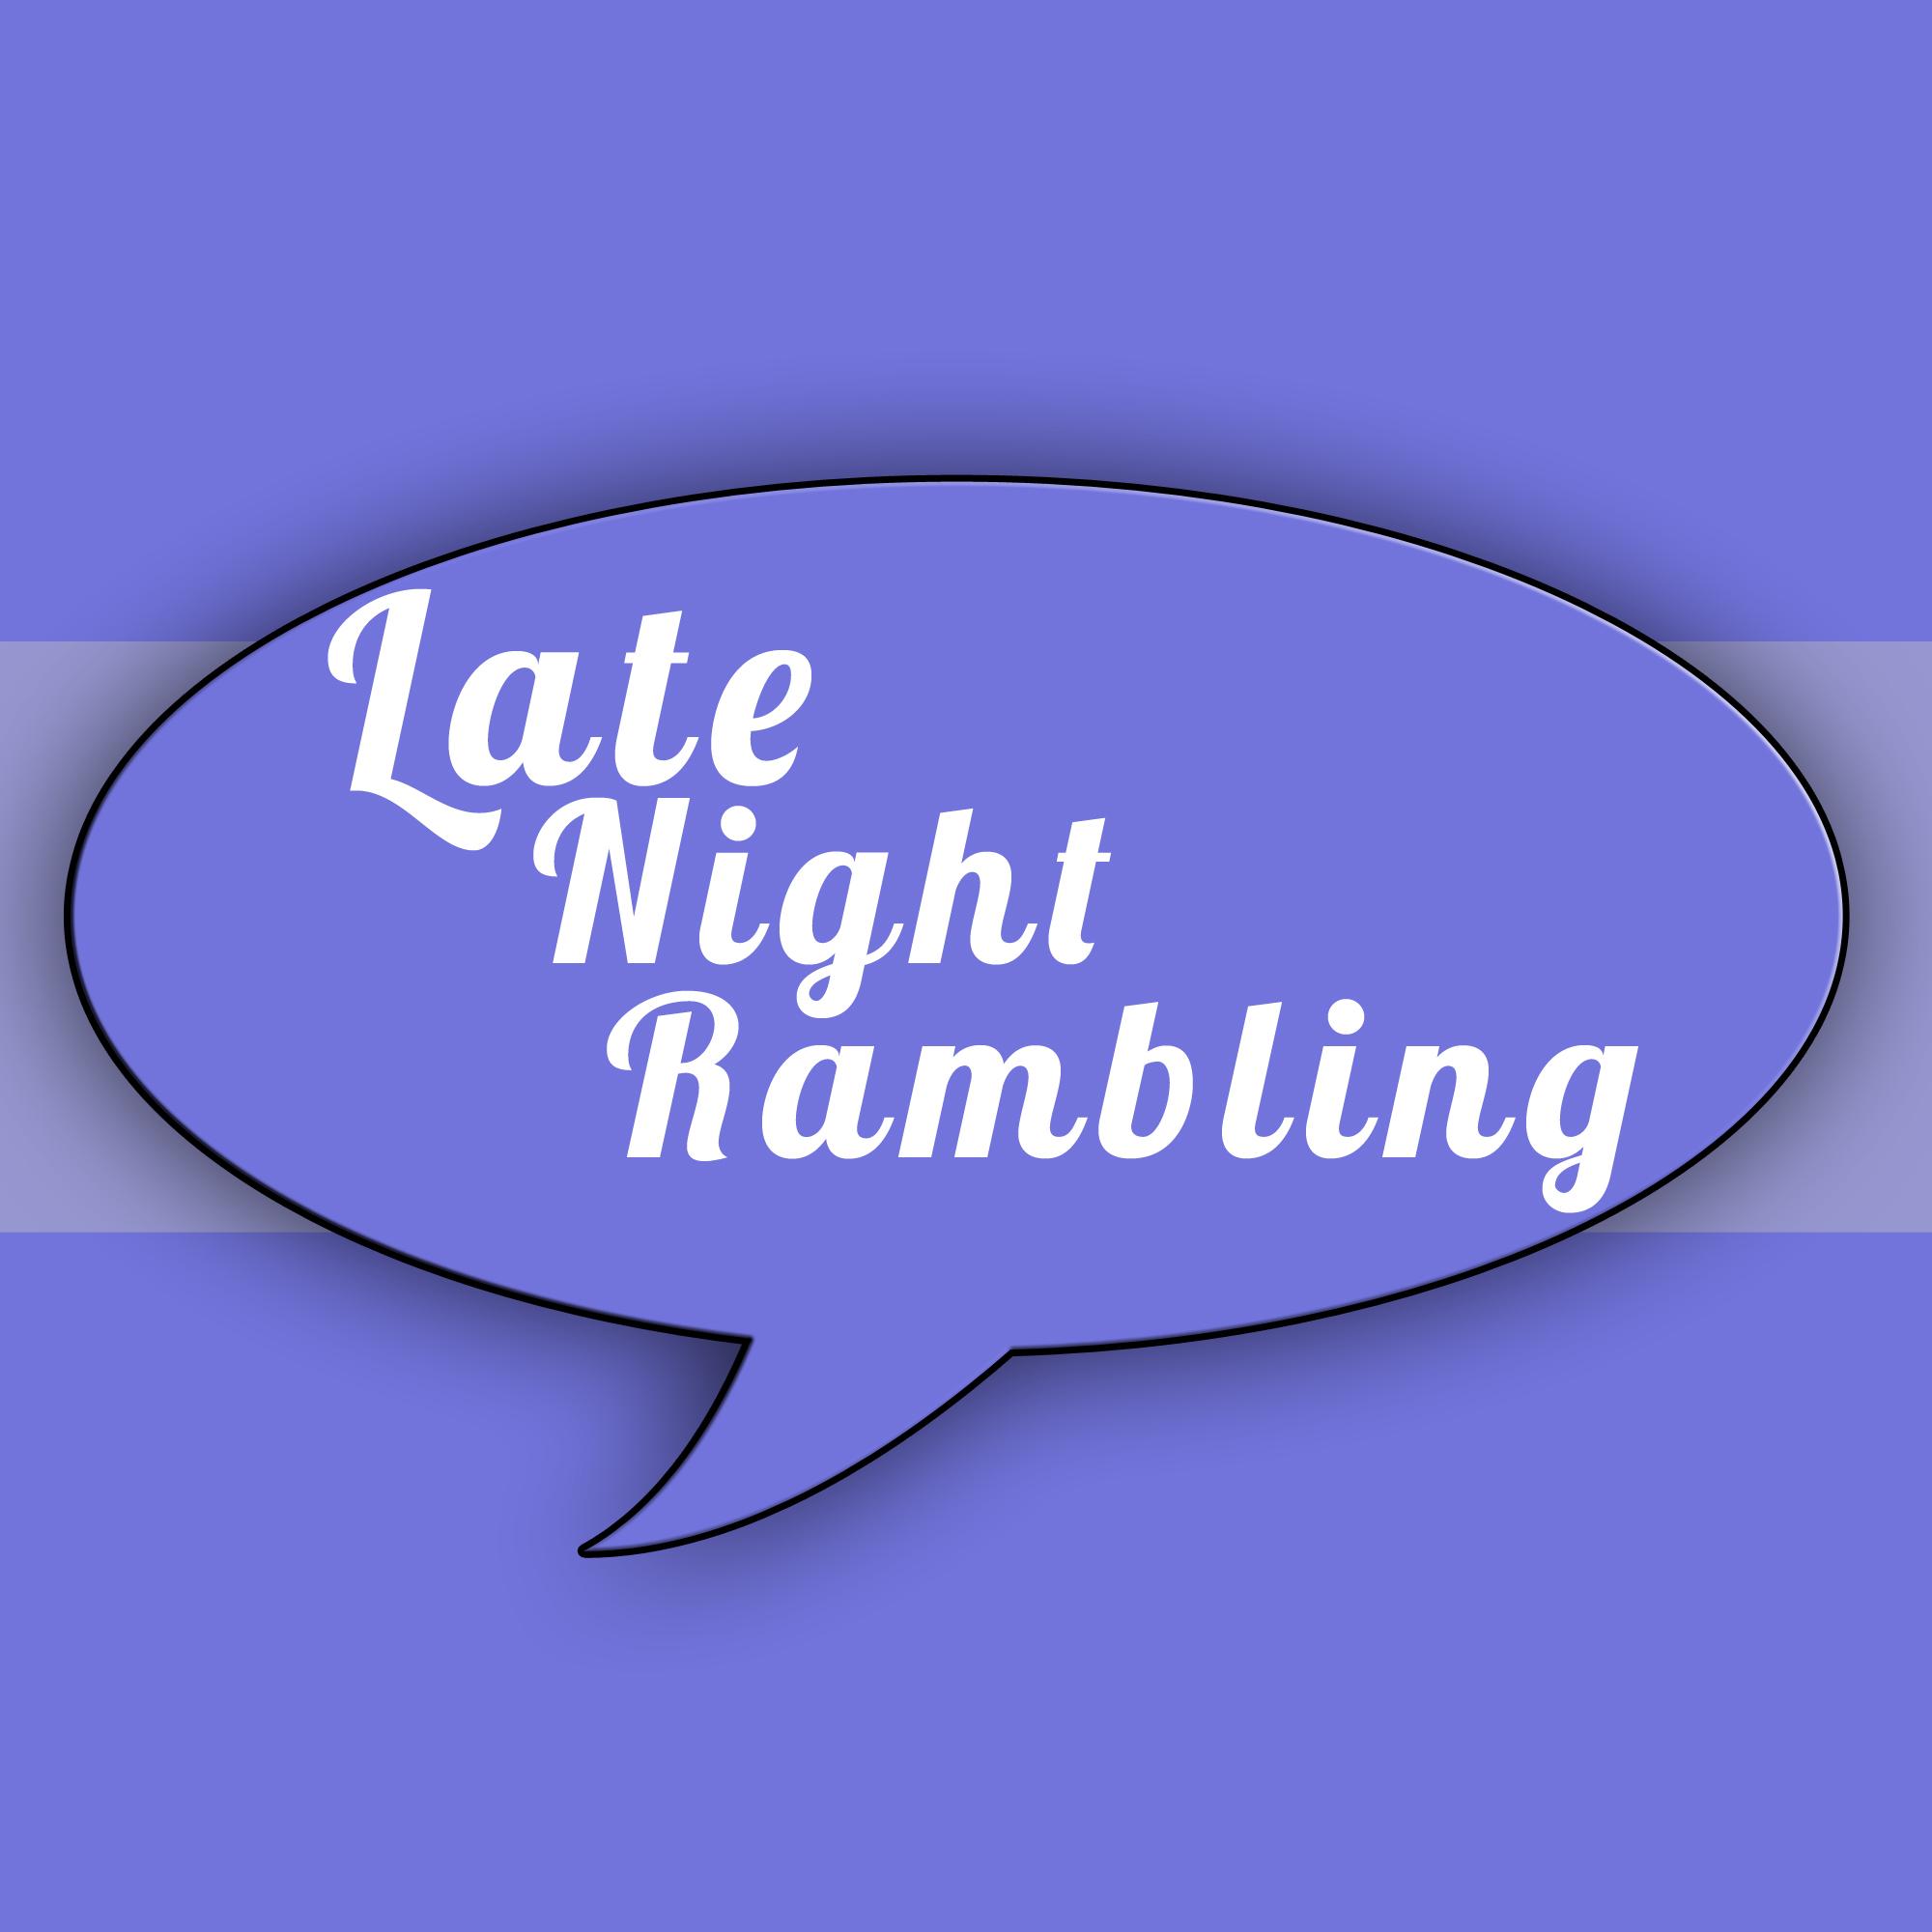 Late Night Rambling